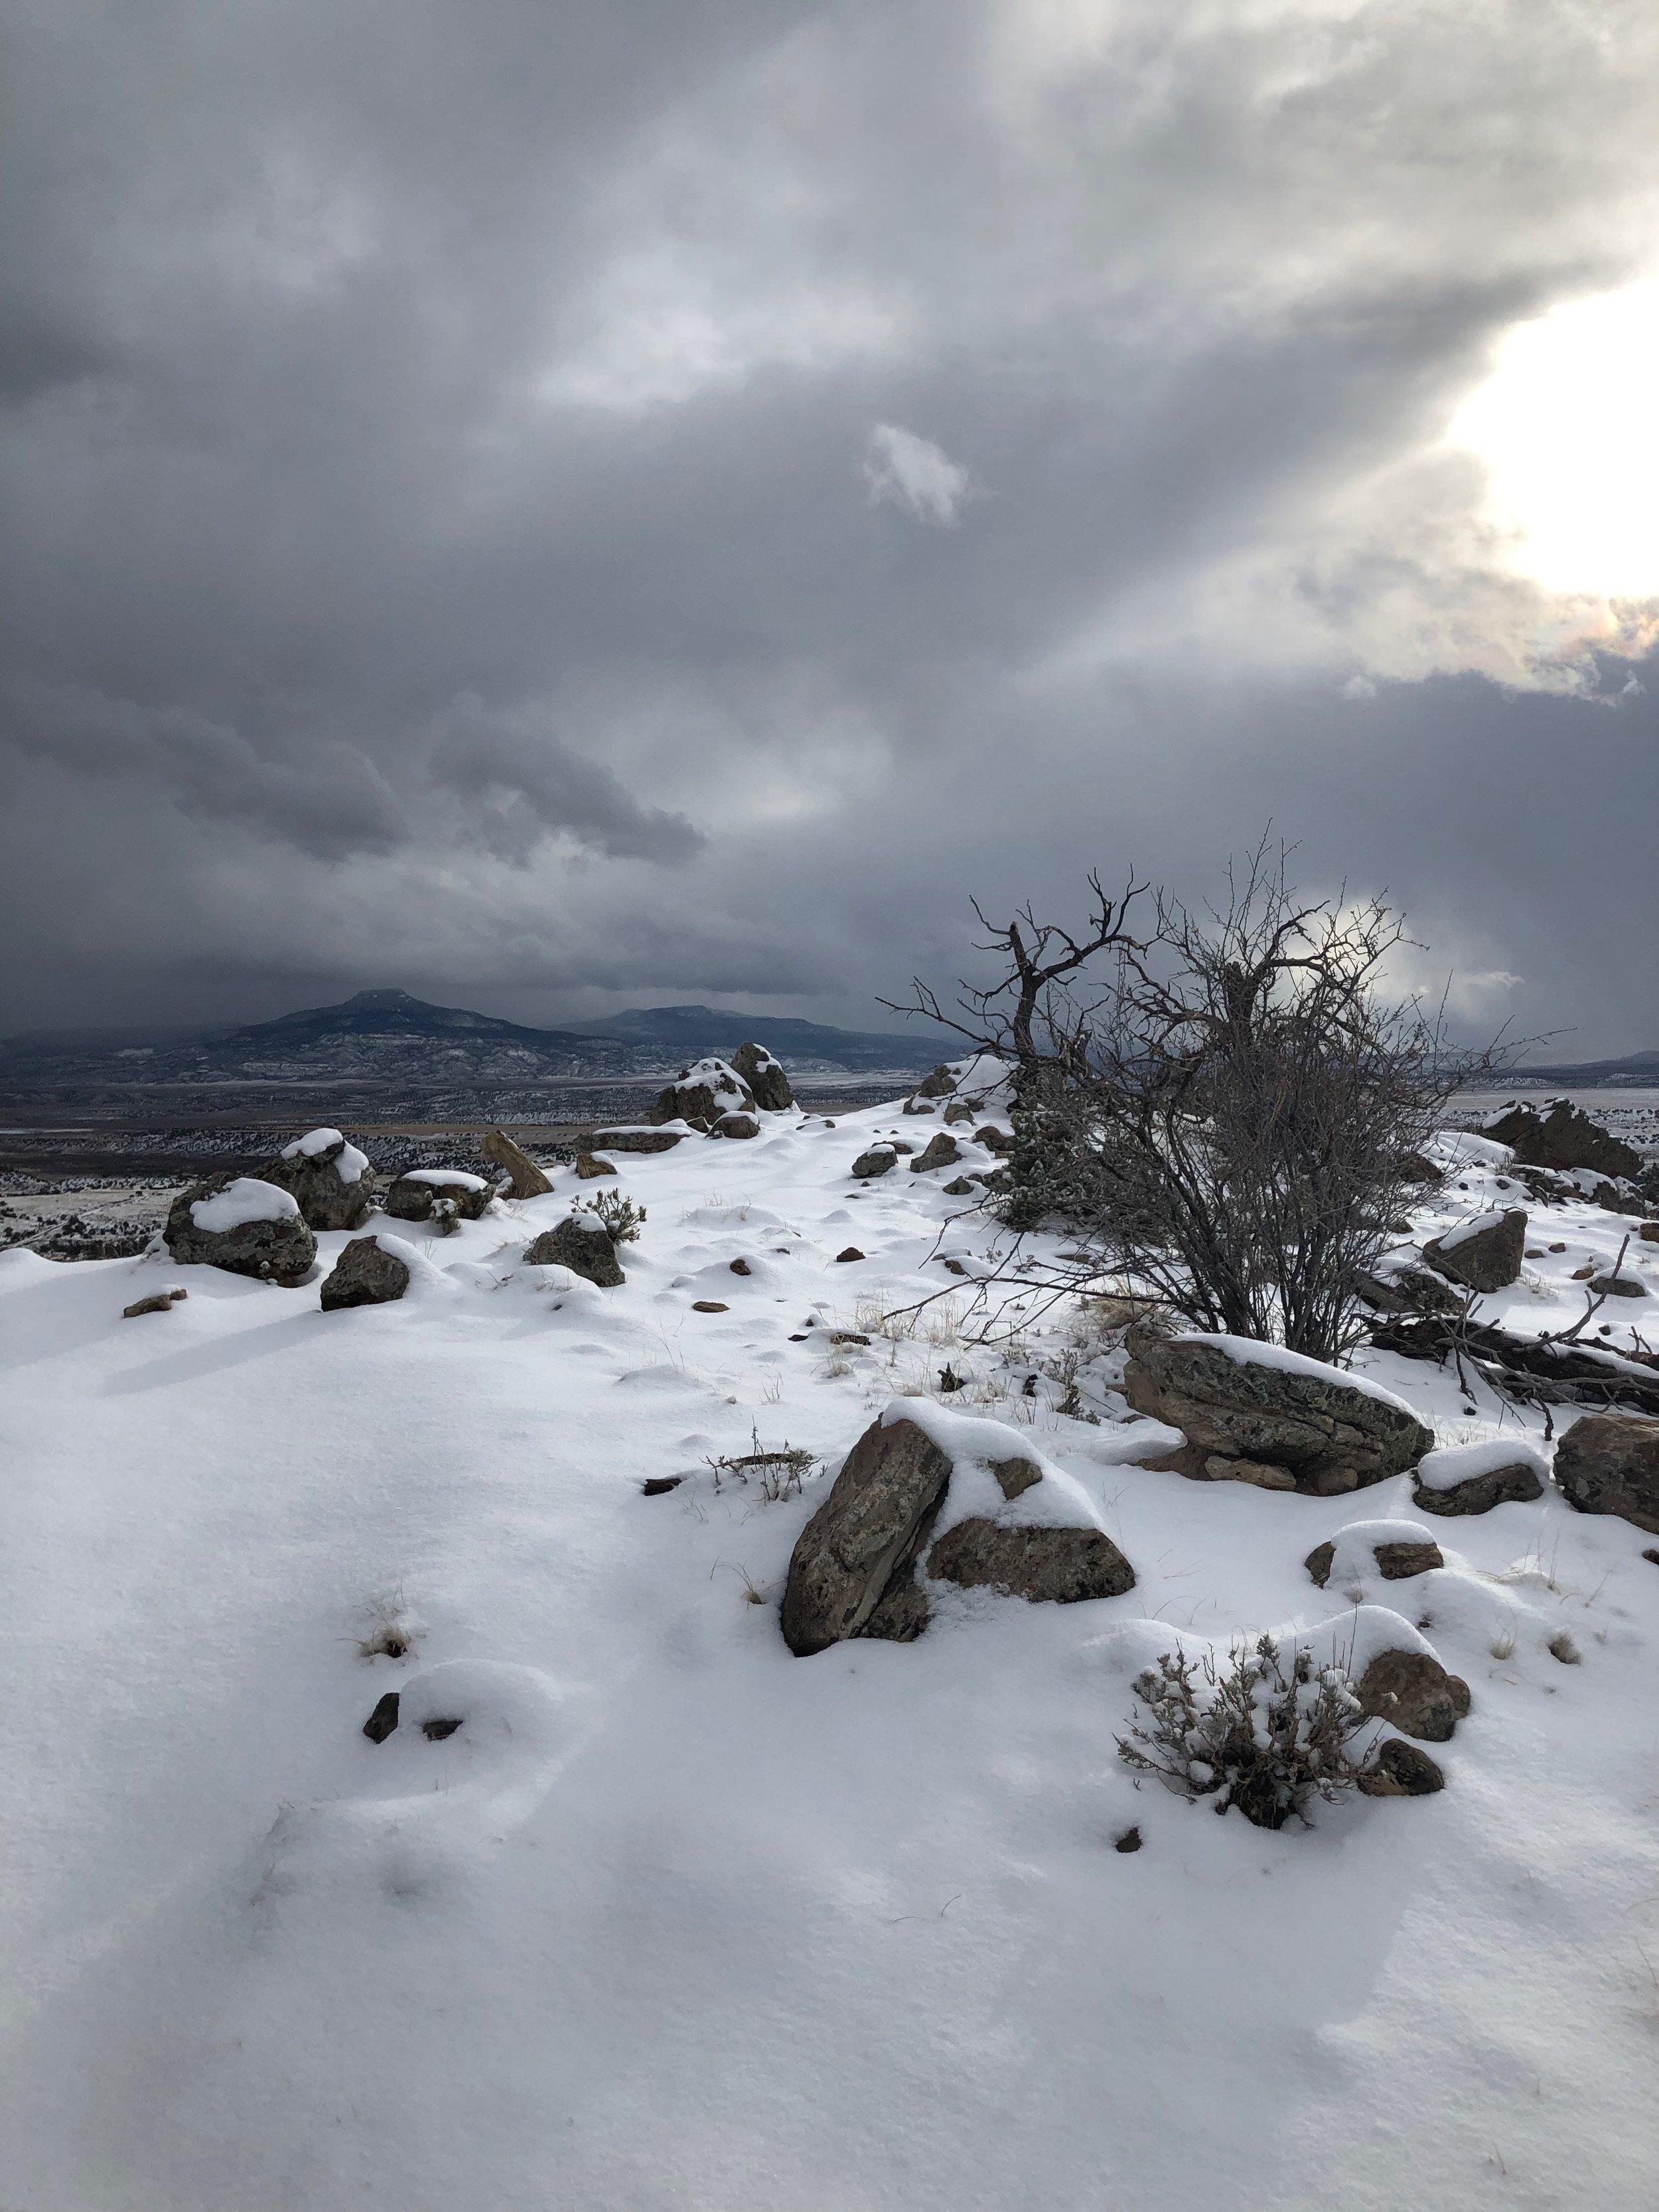 pedernal in the snow - rebecca mir grady